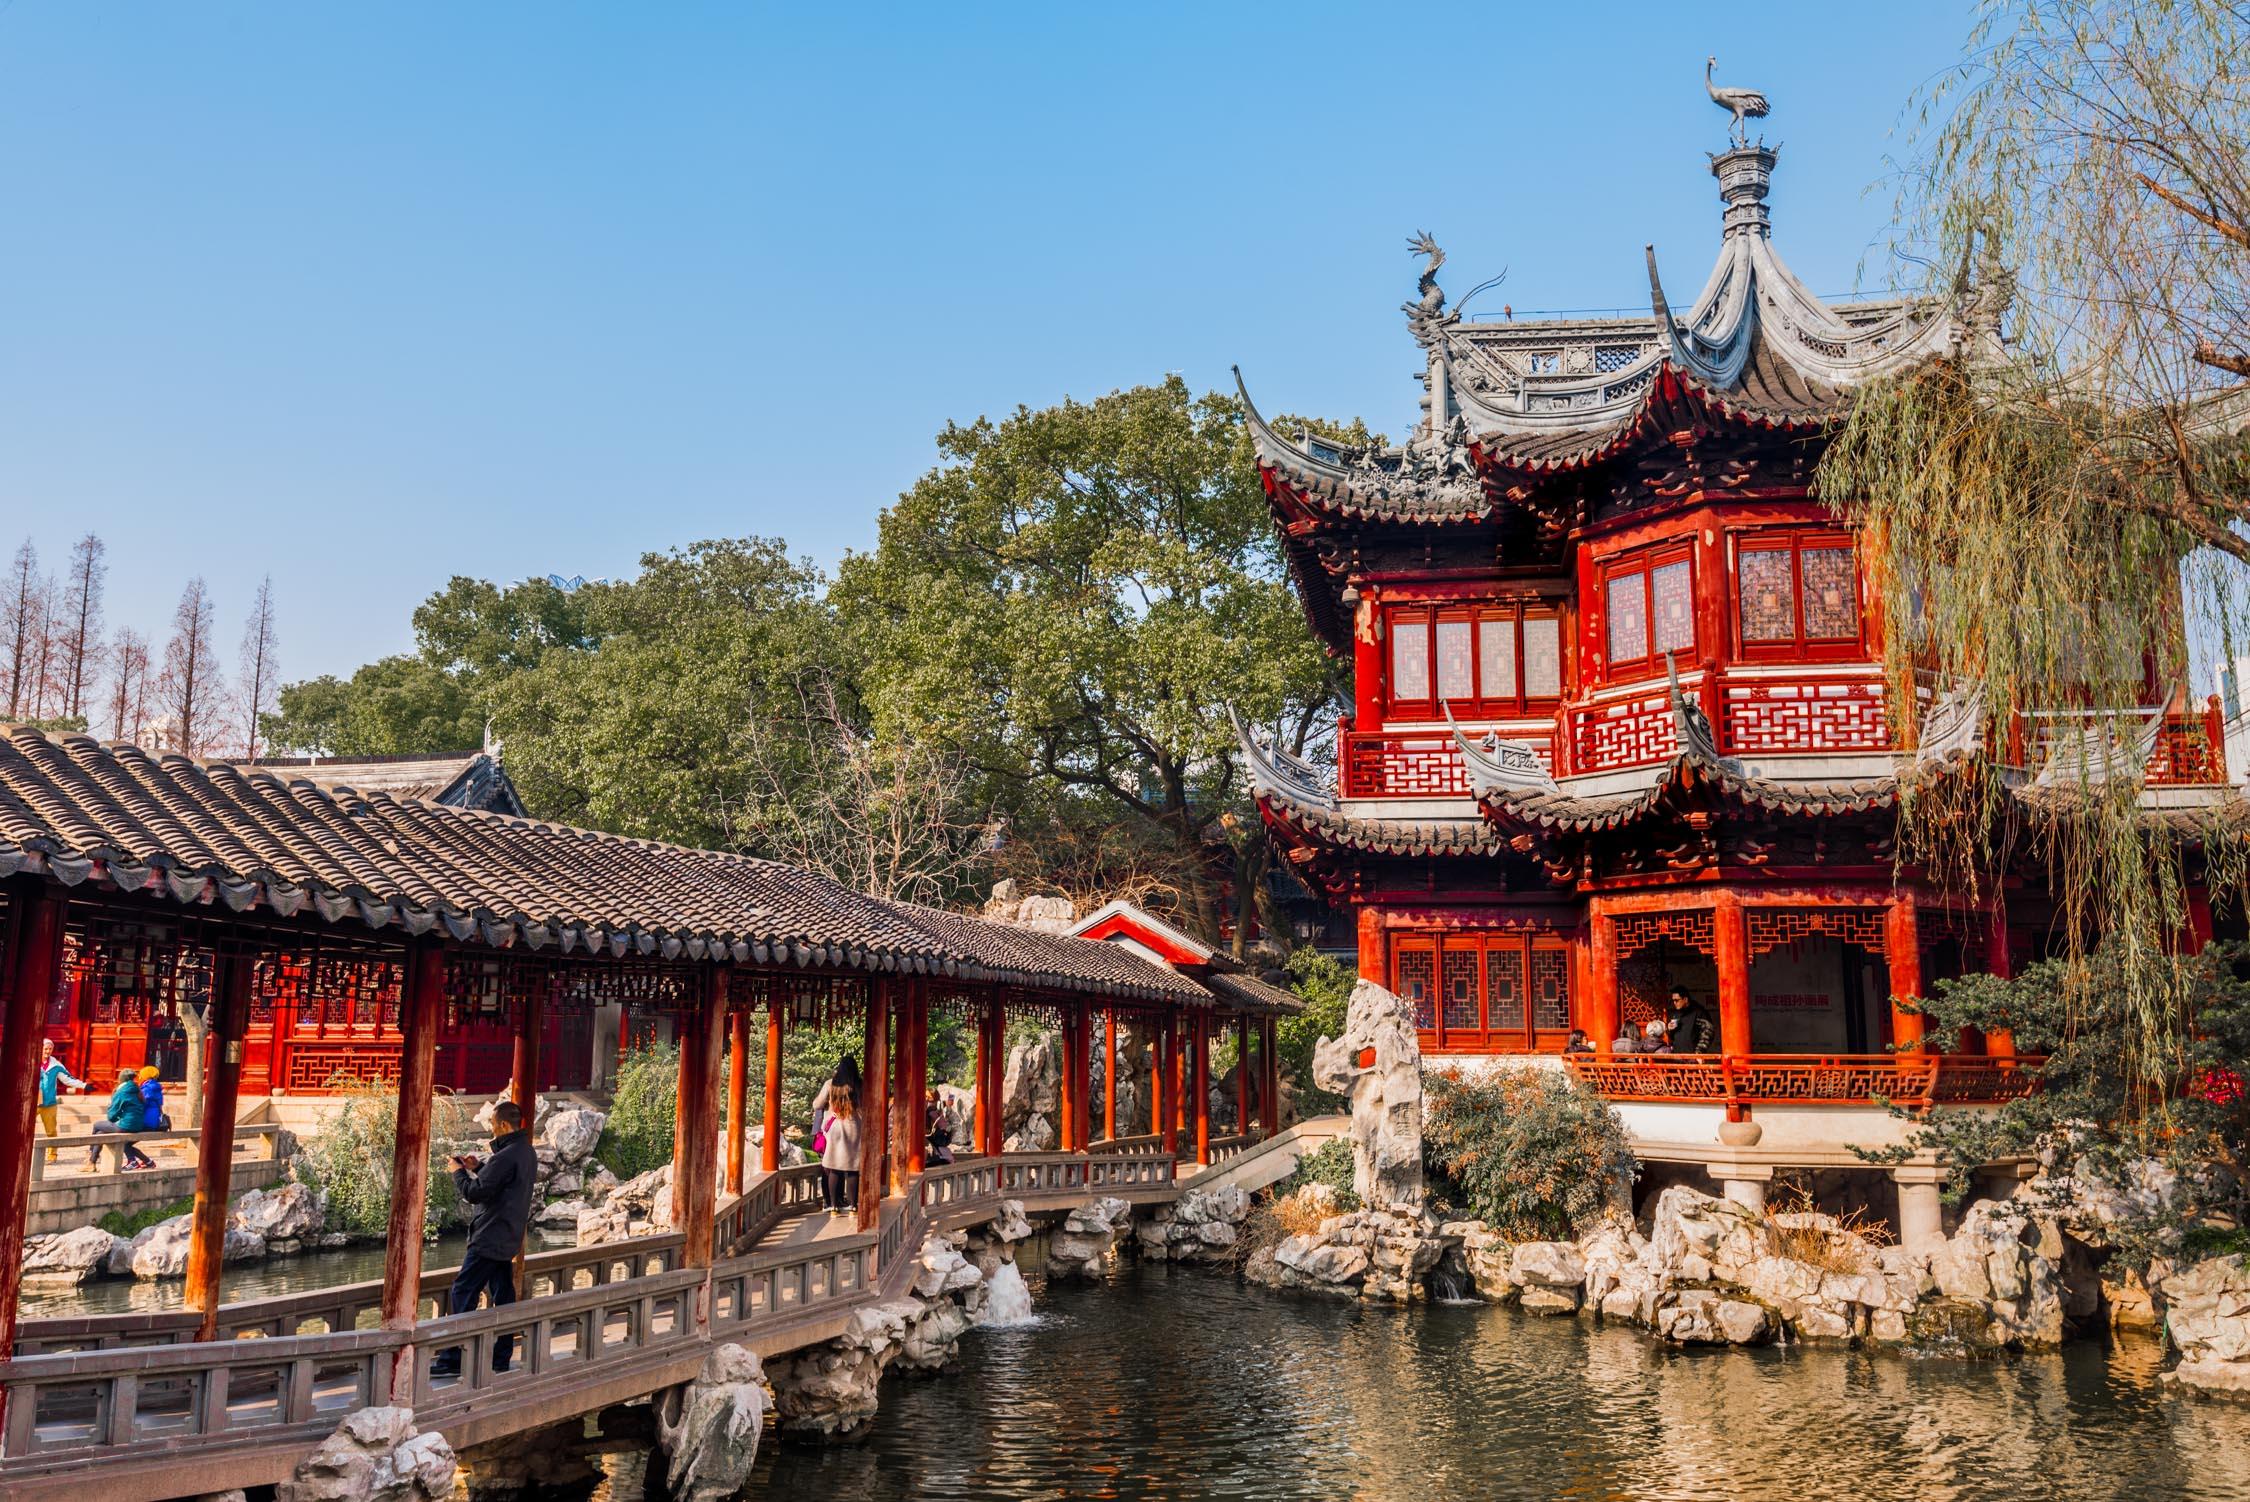 Yu Gardens in Shanghai